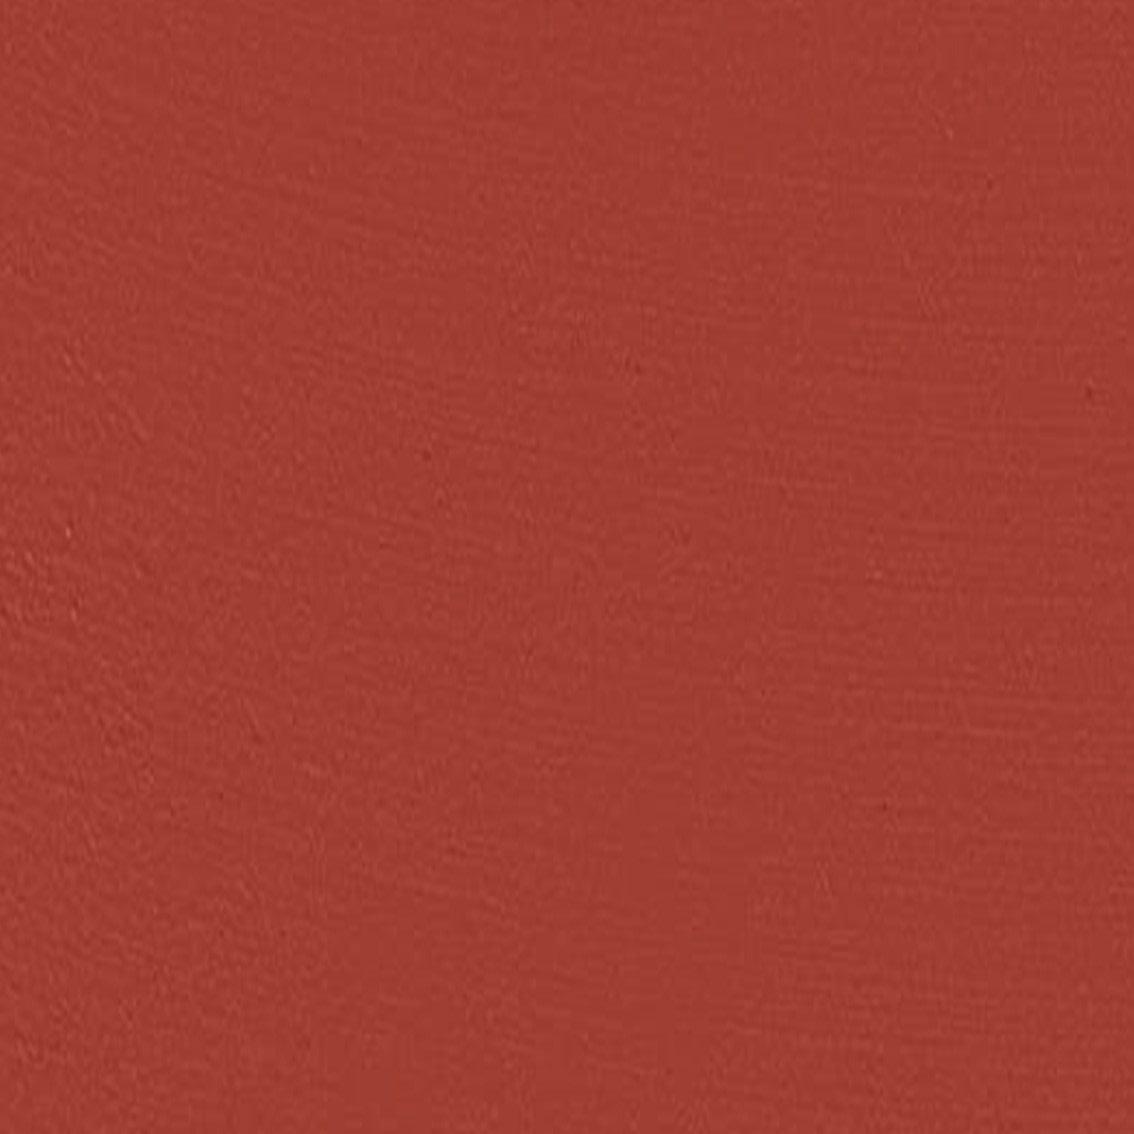 o Boticário Make B. Cremoso Brown Brown - Batom 3,6g